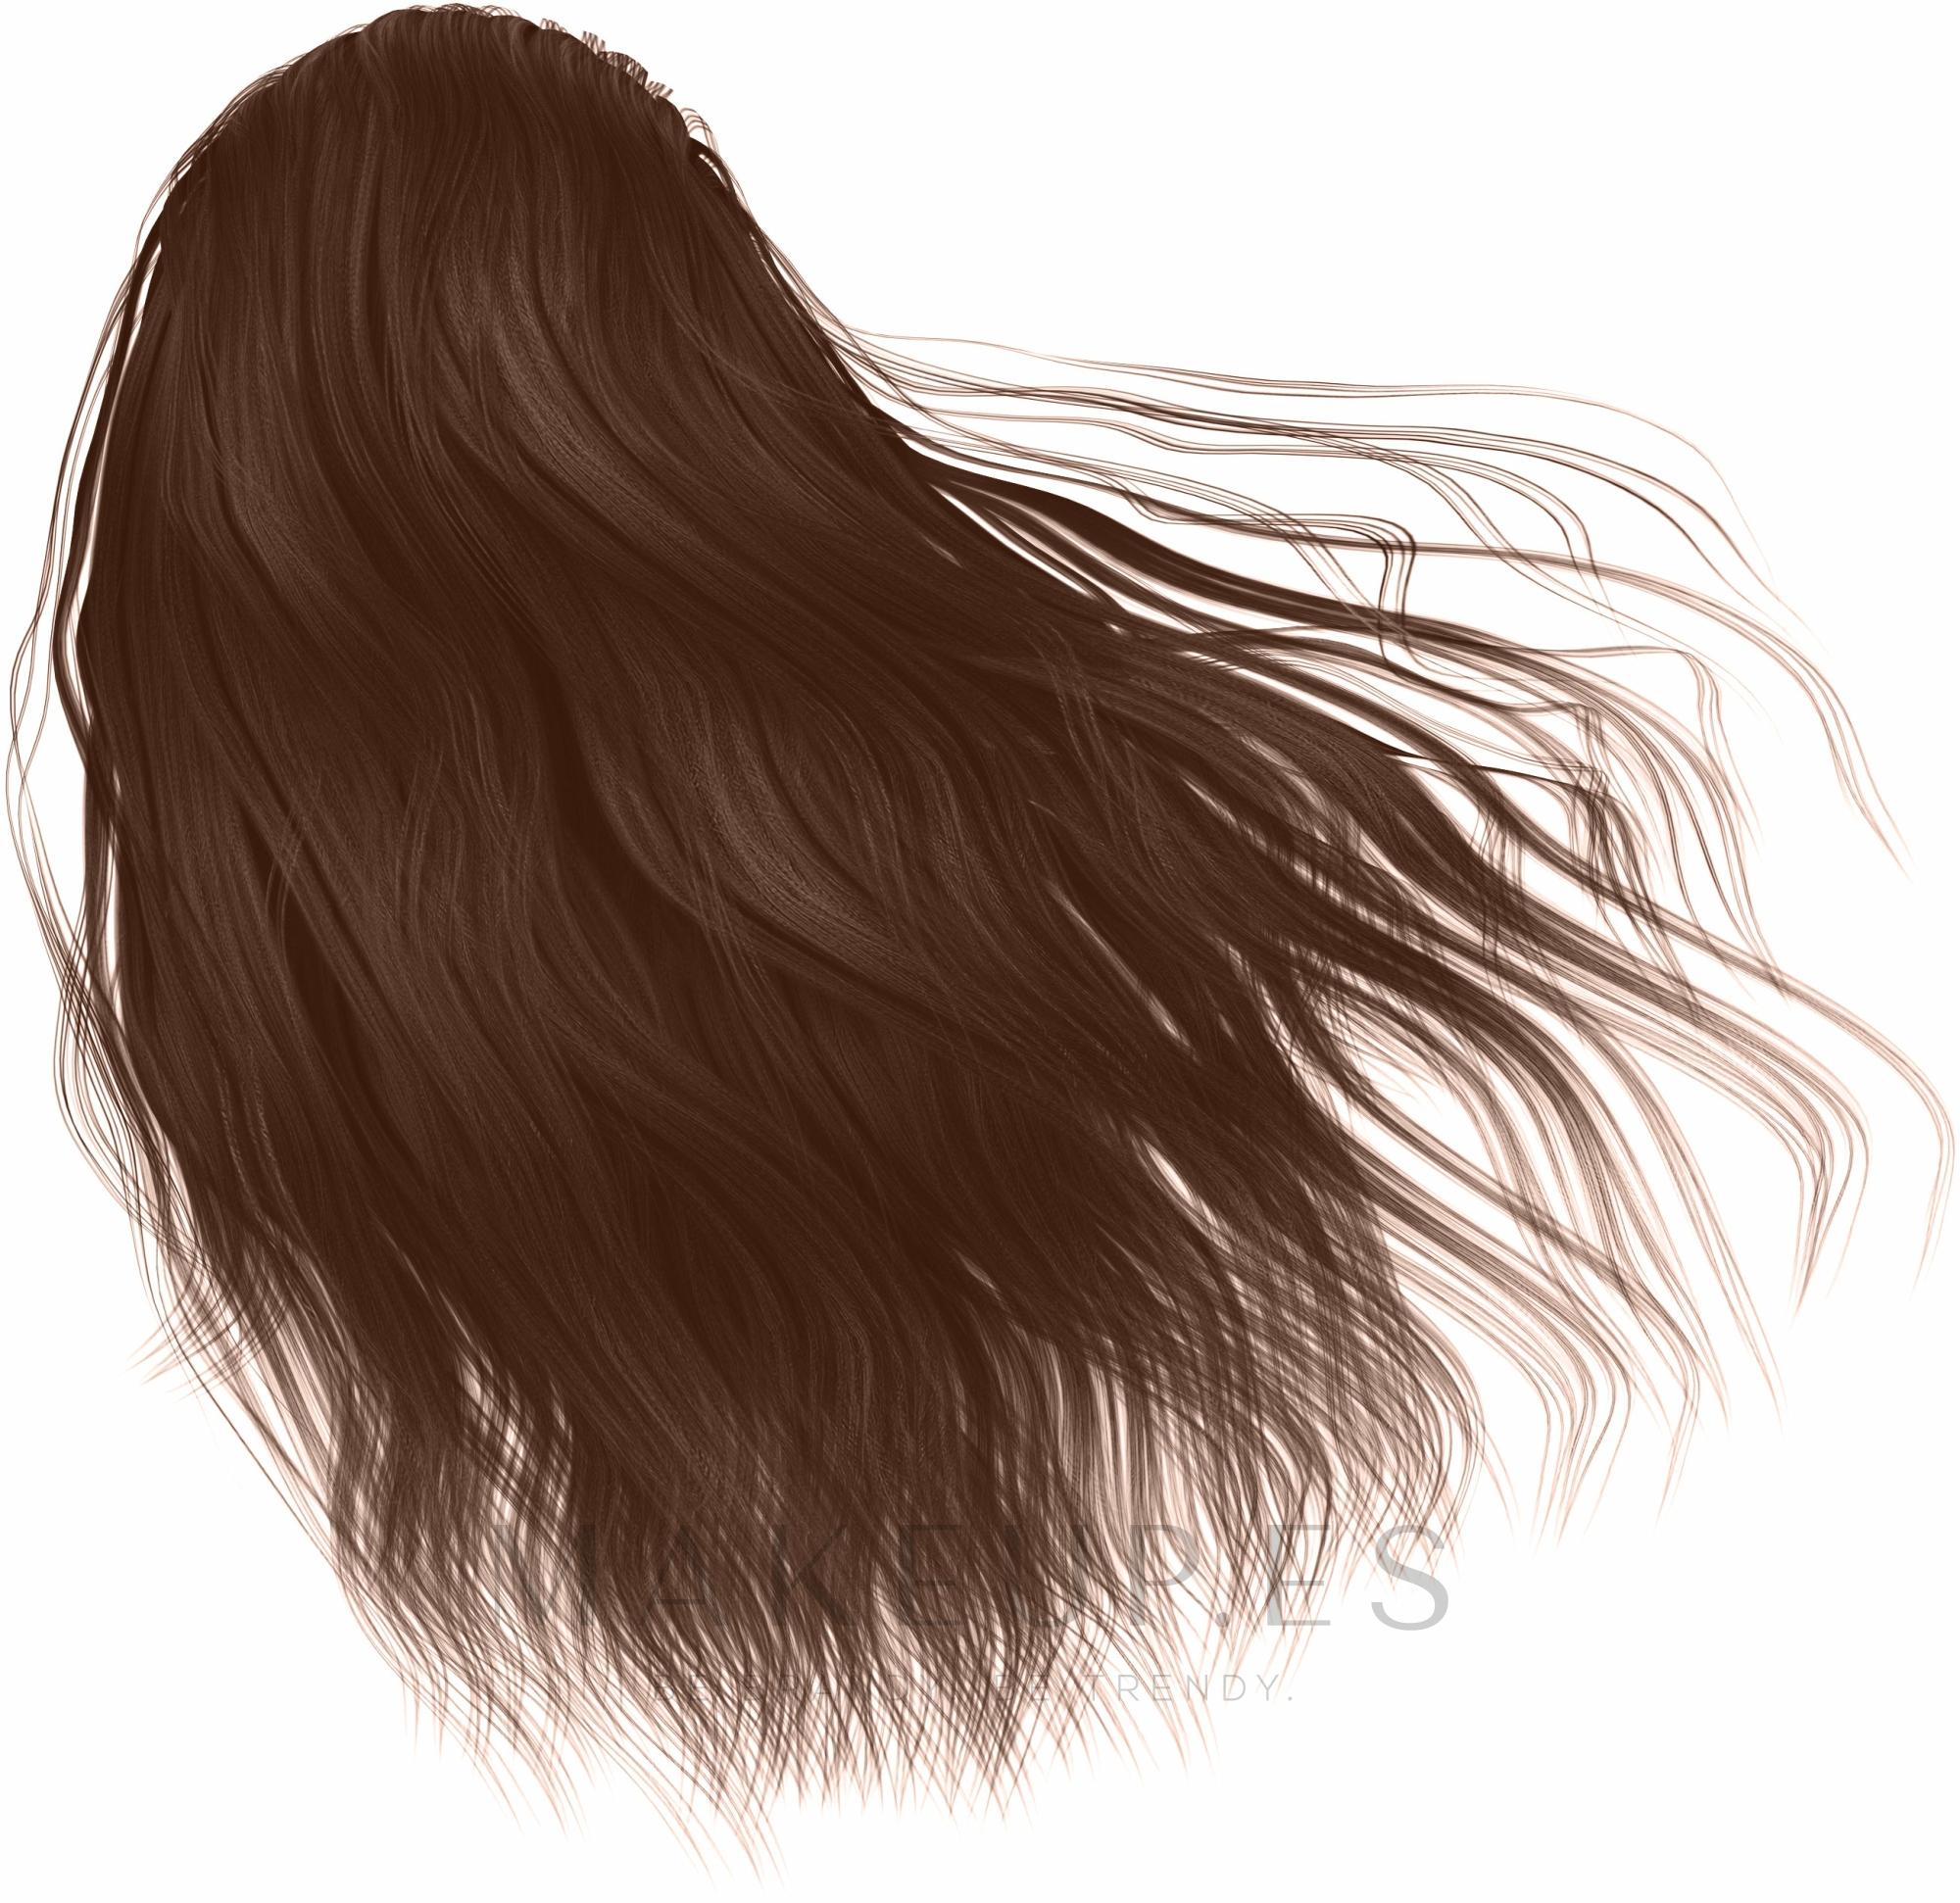 Tinte para cabello - Revlon Professional Revlonissimo Anti Age Technology High Coverage XL150 — imagen 6.34 - Rubio oscuro avellana